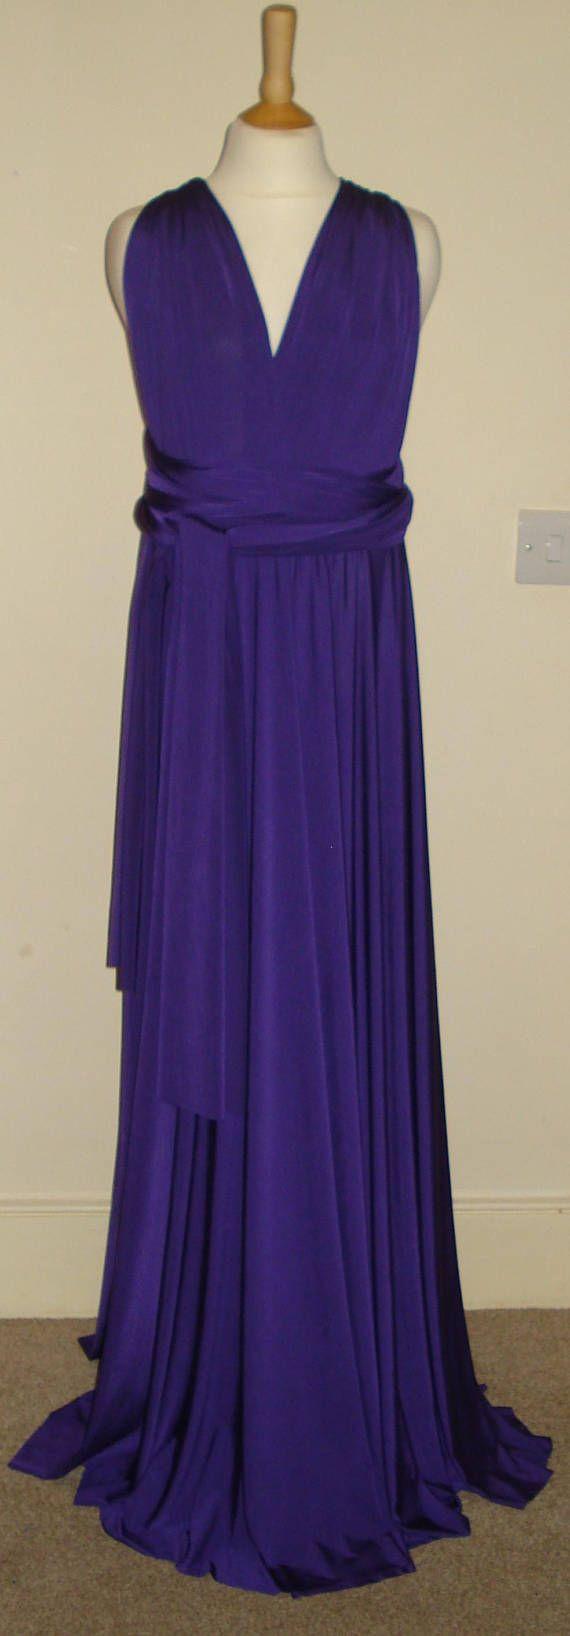 Purple Junior Infinity Dress Flower Girl Dress Teen Bridesmaid Dress ...